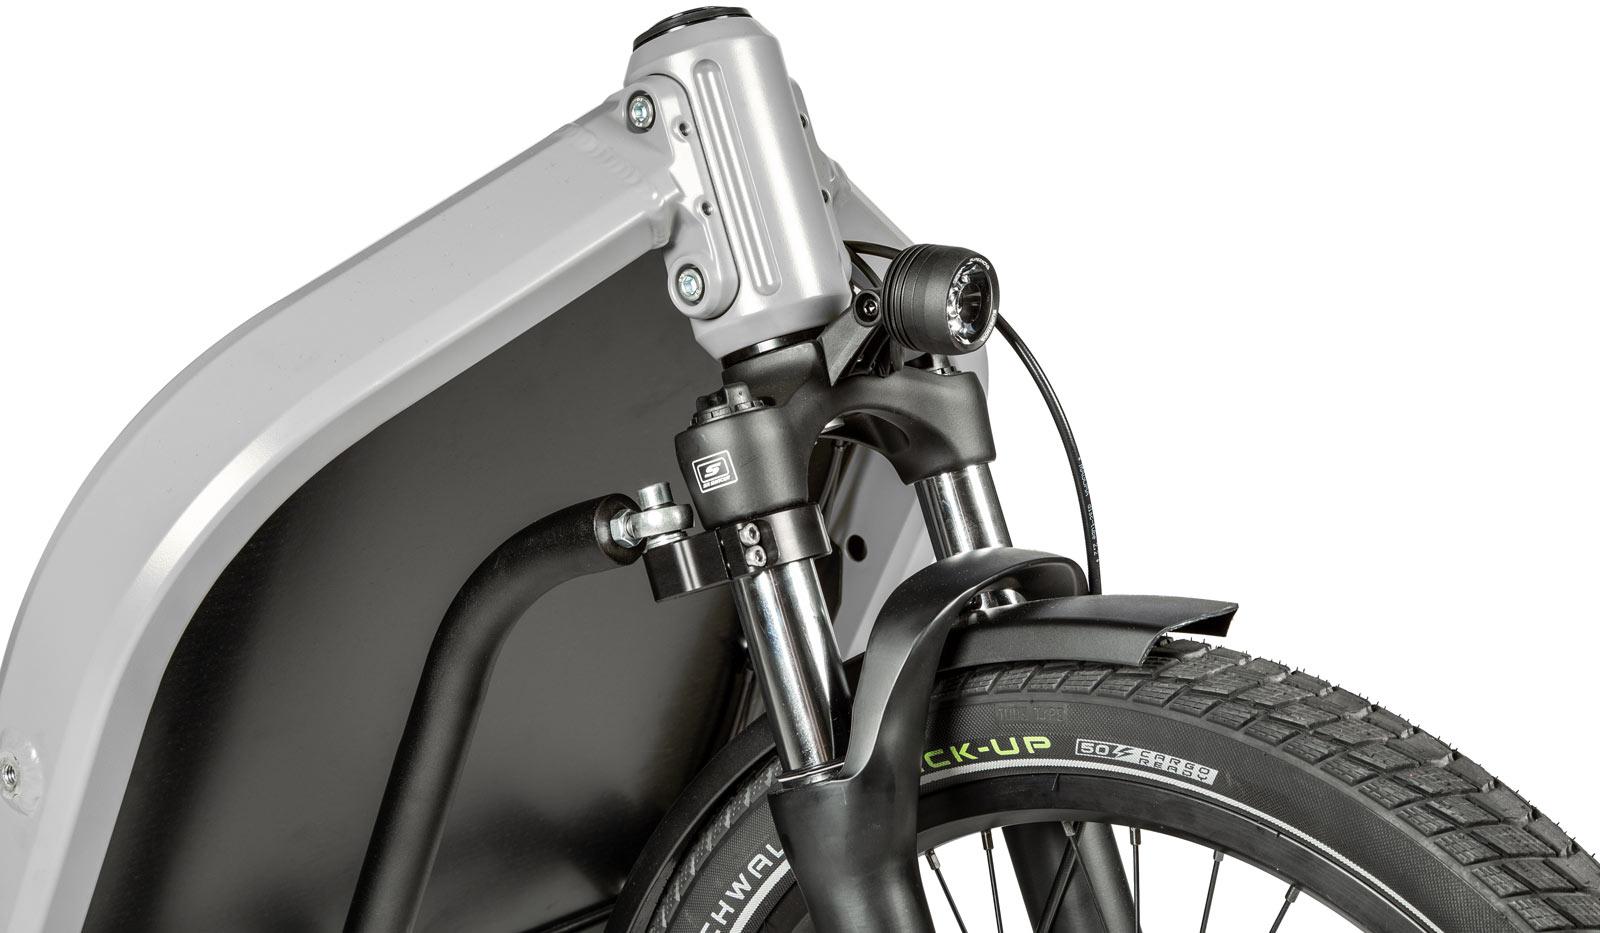 nicolai nc-1 cargo ebike 70mm travel suntour fork steering bump stops